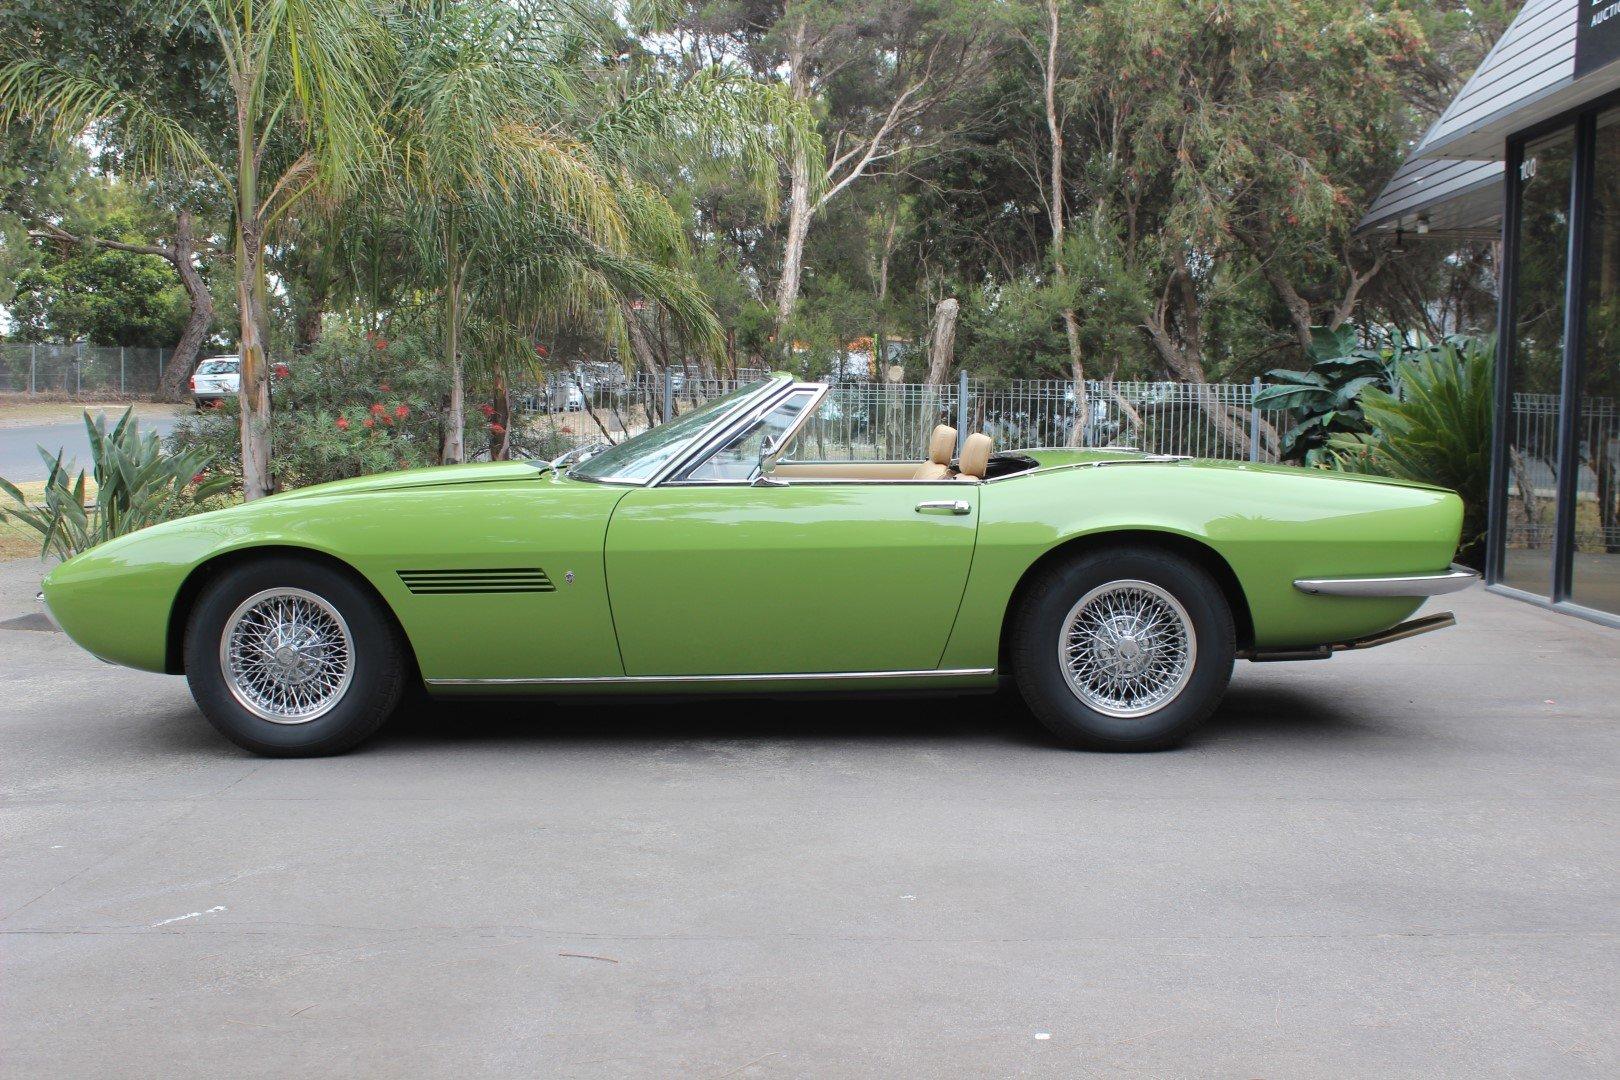 Maserati Ghibli 1969 For Sale (picture 1 of 6)